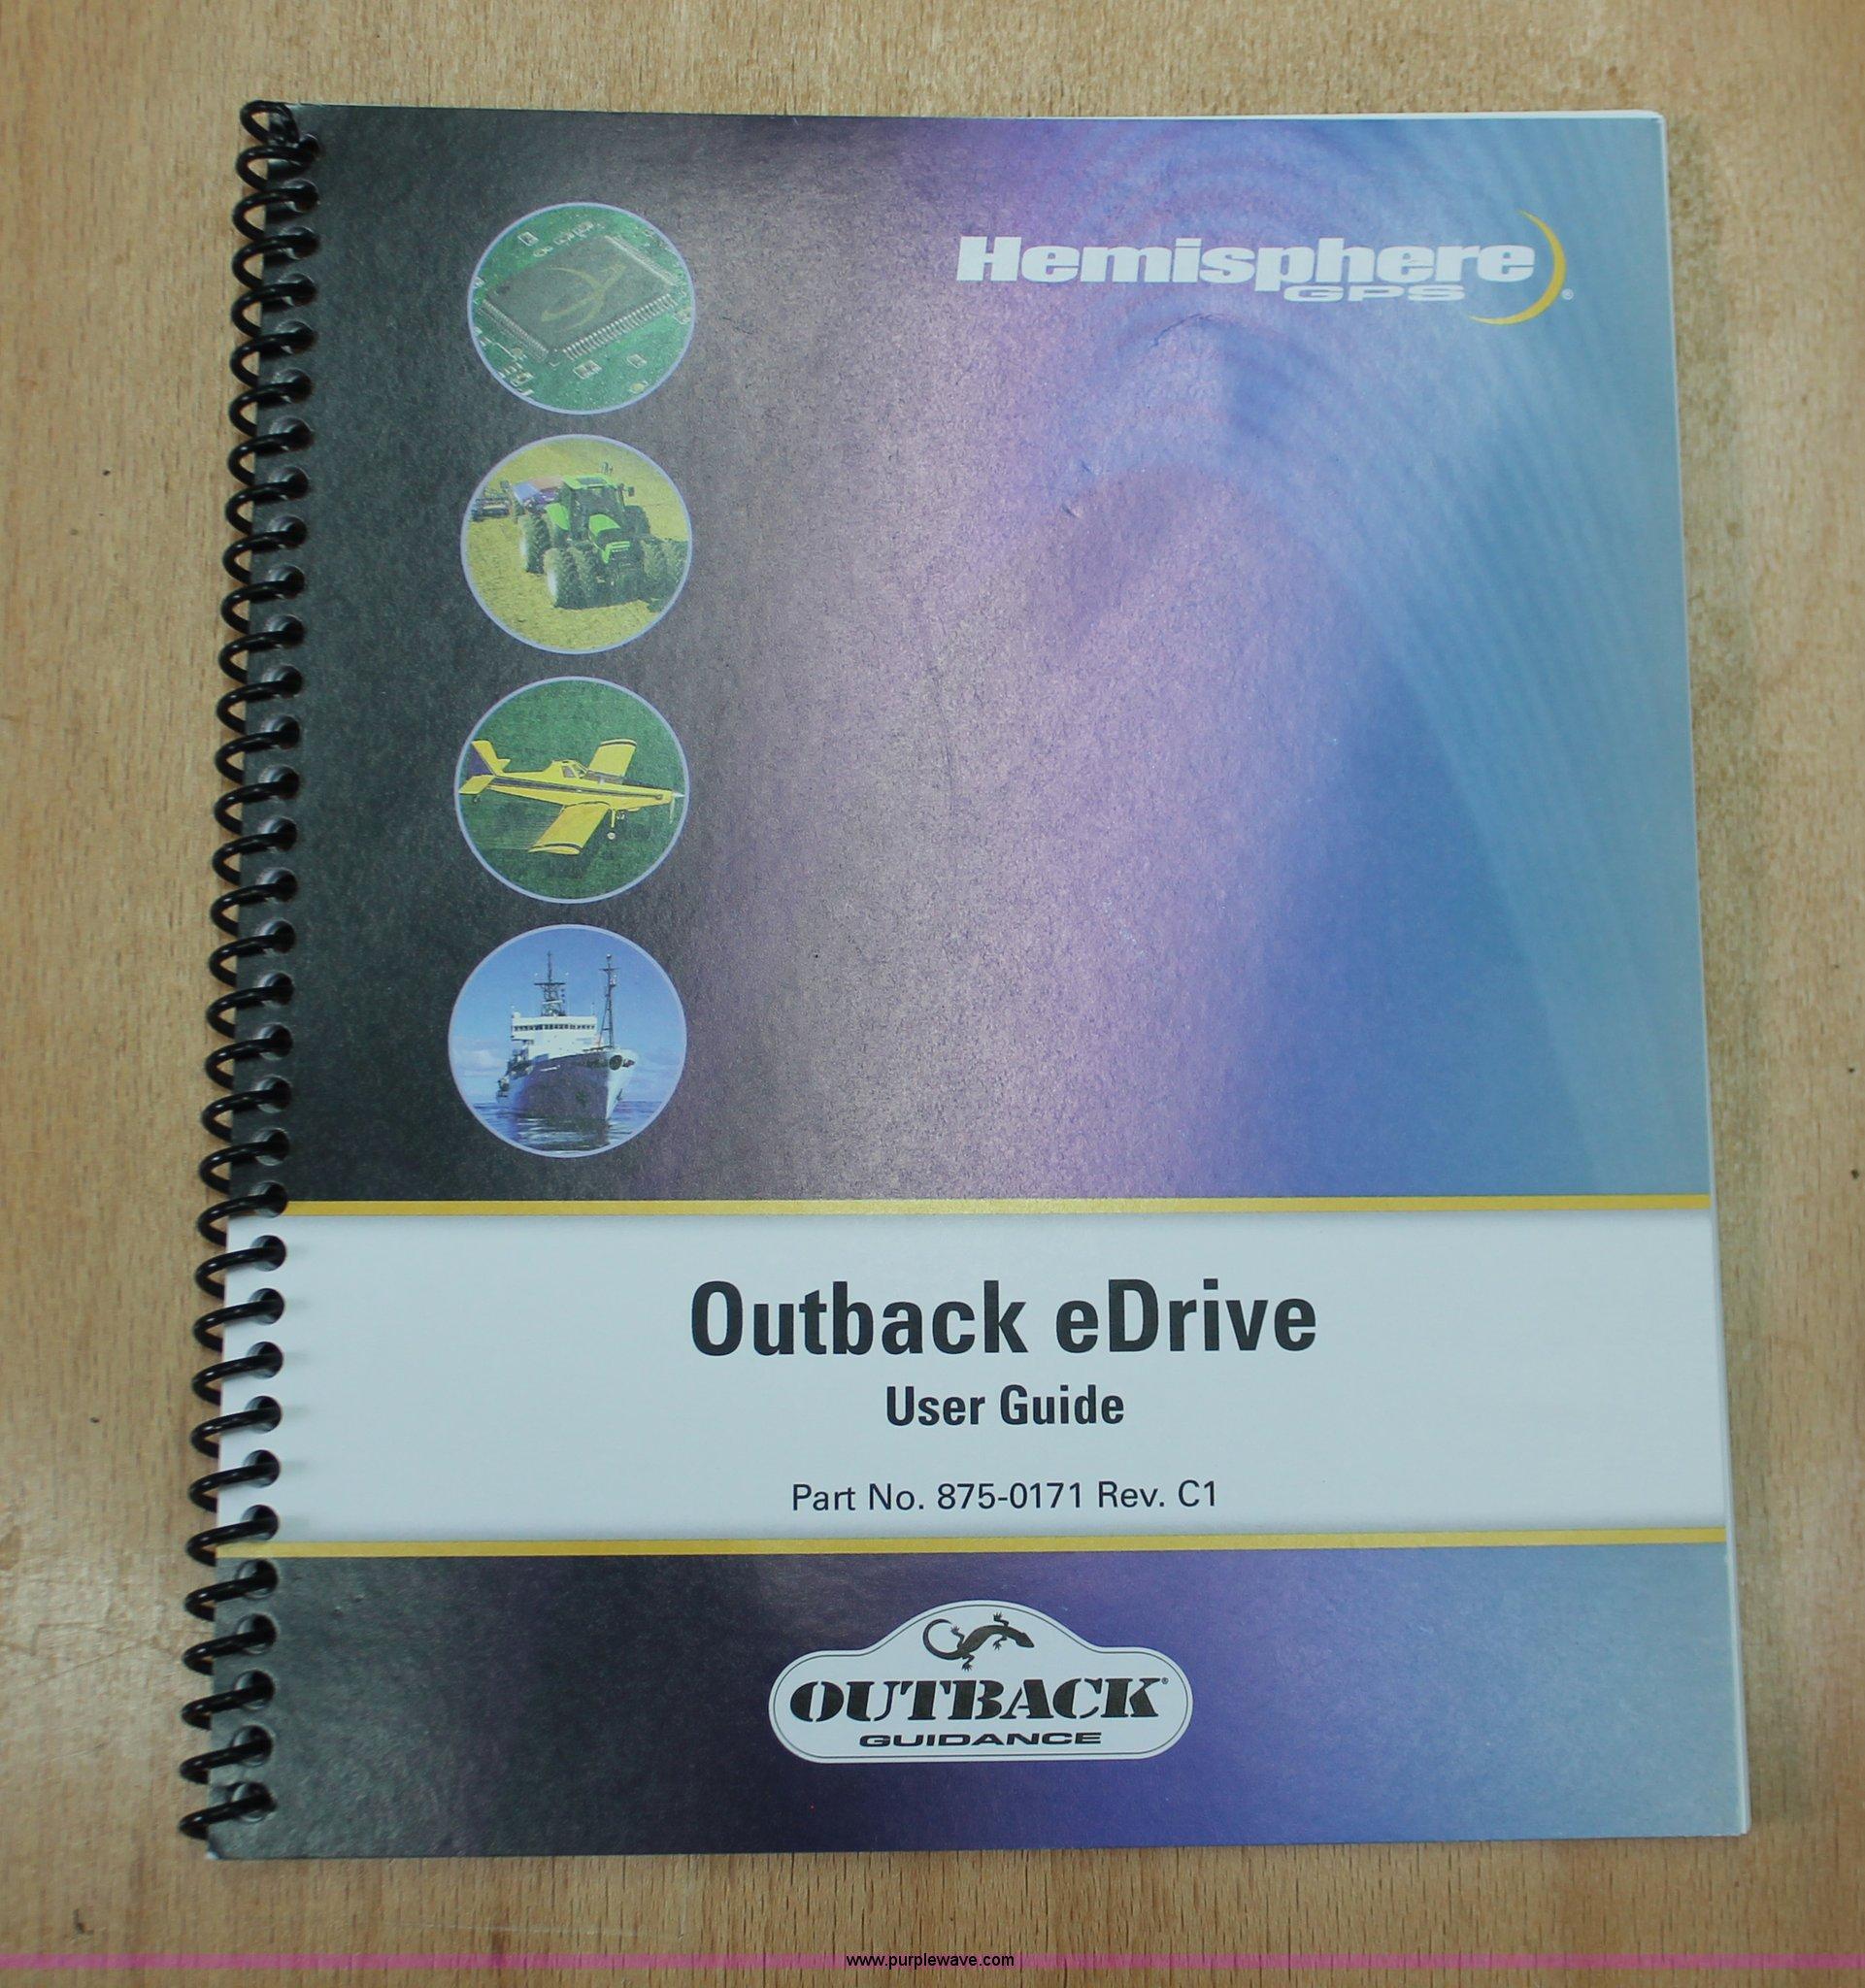 2008 Hemisphere Outback eDrive automated steering system | I...